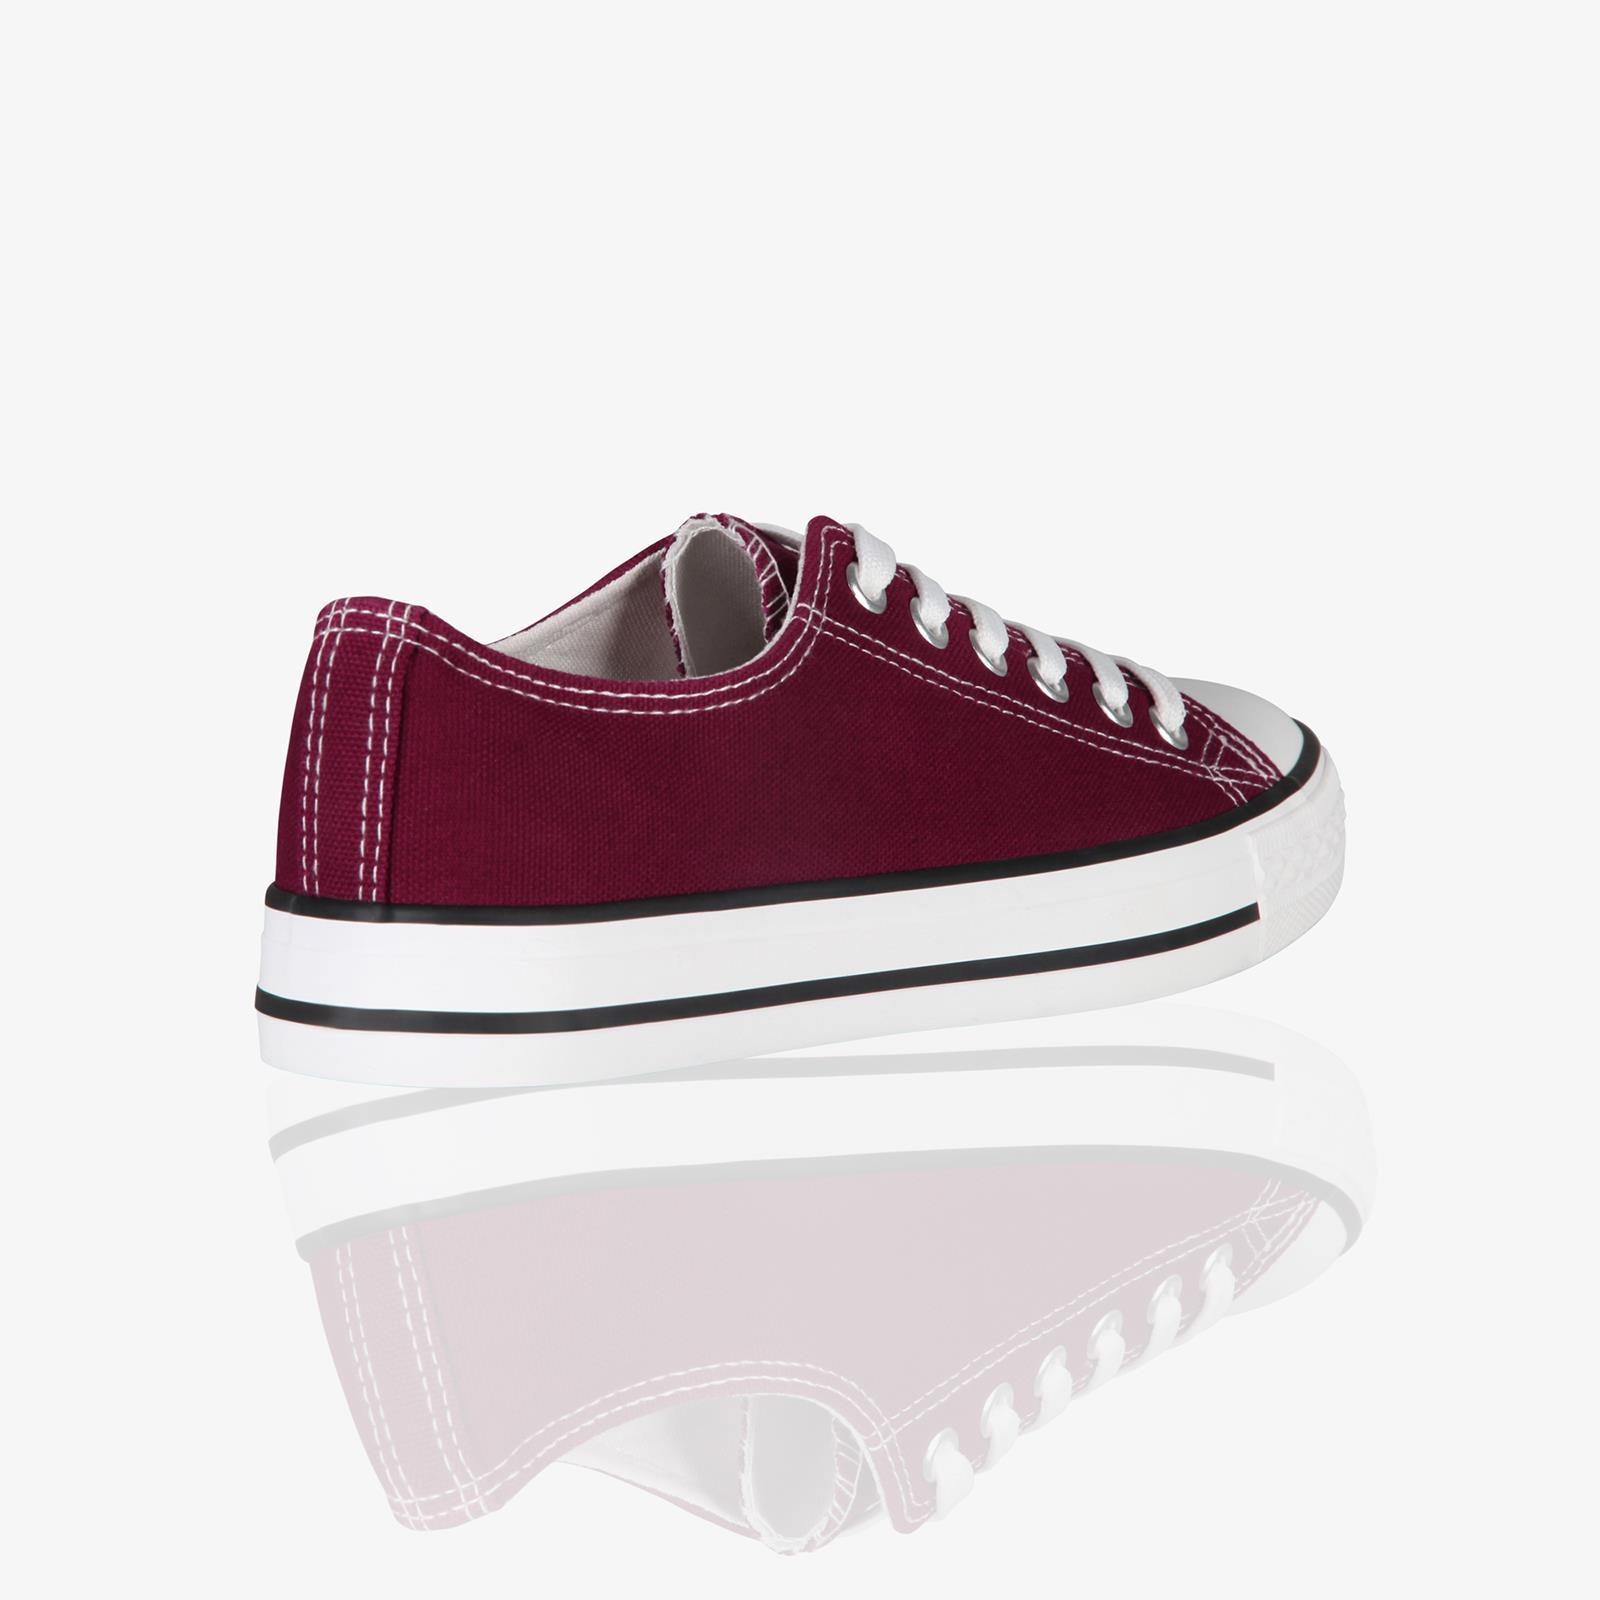 Zapatillas-Mujer-Casuales-Deportiva-Barata-Lona-Moda-Originales-Outlet-Tela-Moda miniatura 15